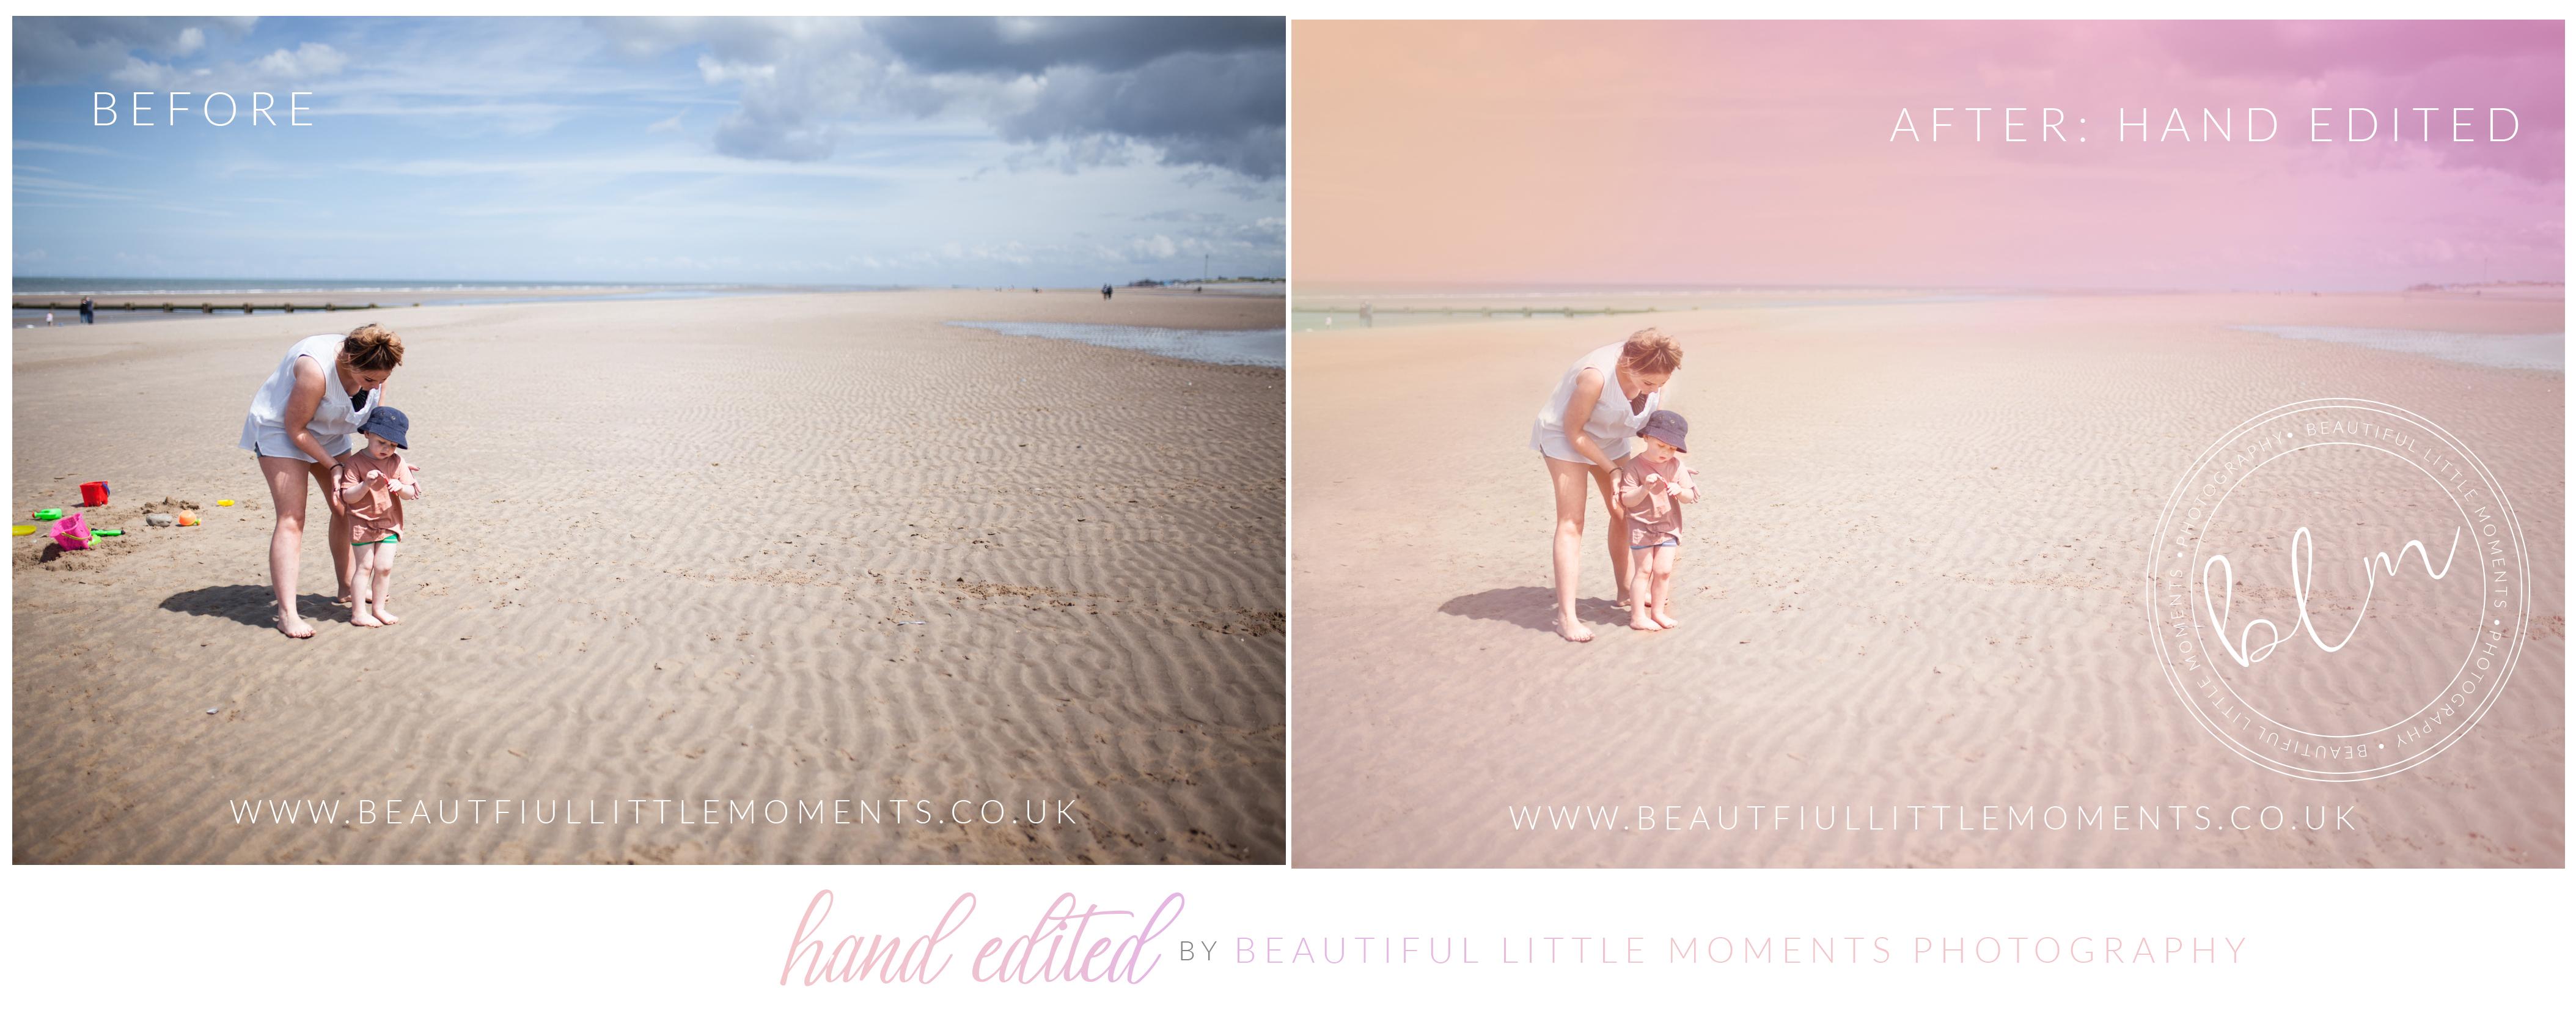 Epsom Child Photography Beautiful Hand Edited Photographs Outdoor